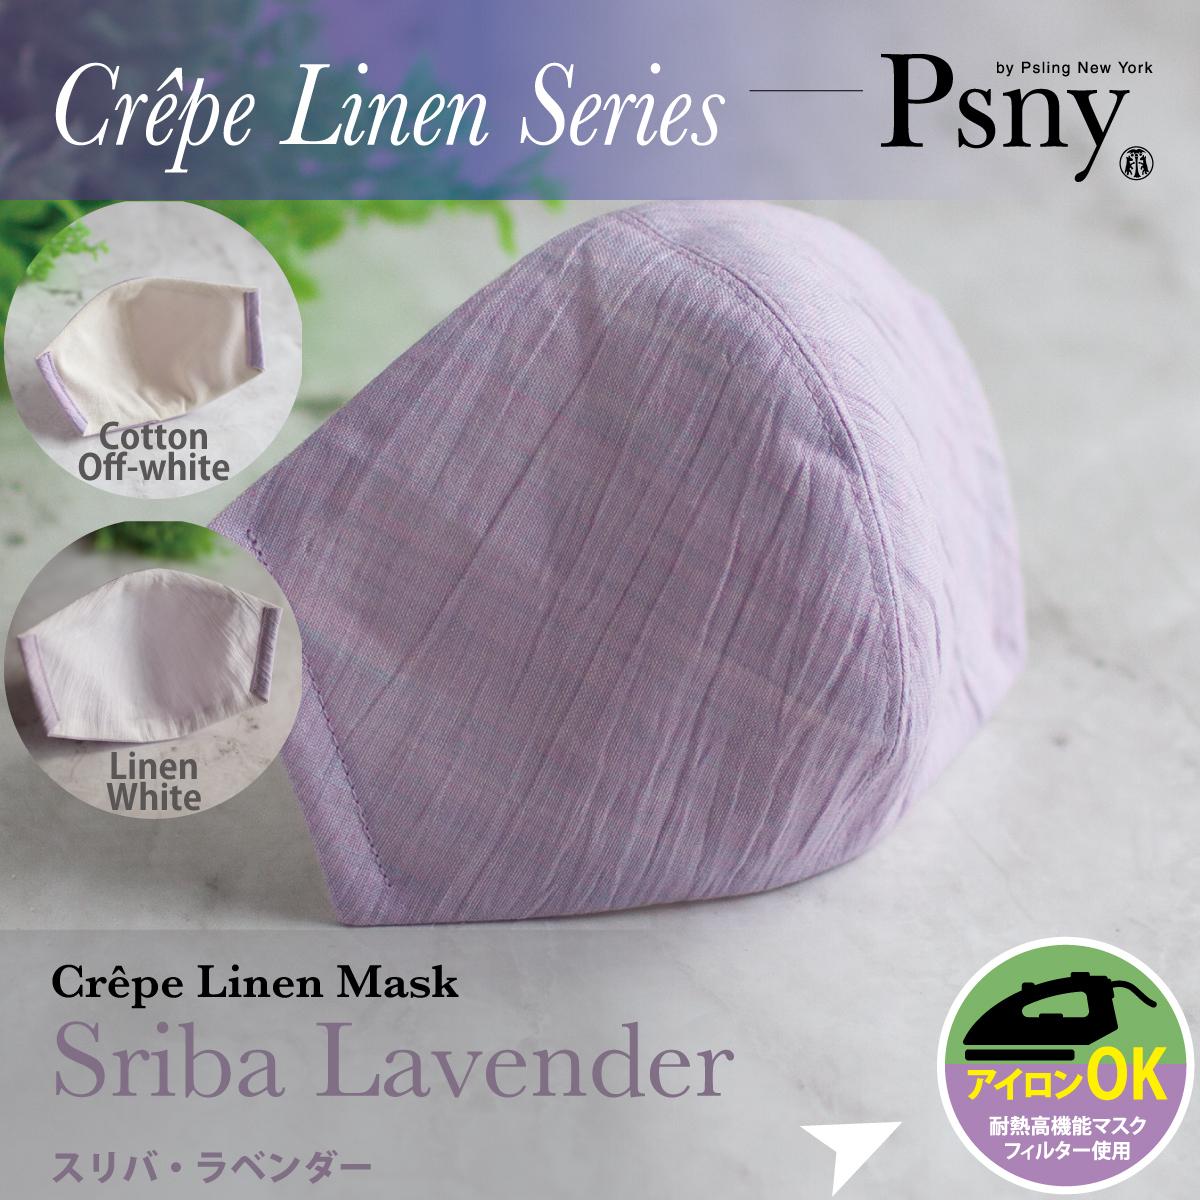 PSNY クレープリネン・スリバ・ラベンダー 花粉 黄砂 洗えるフィルター入り 立体 マスク 大人用 送料無料